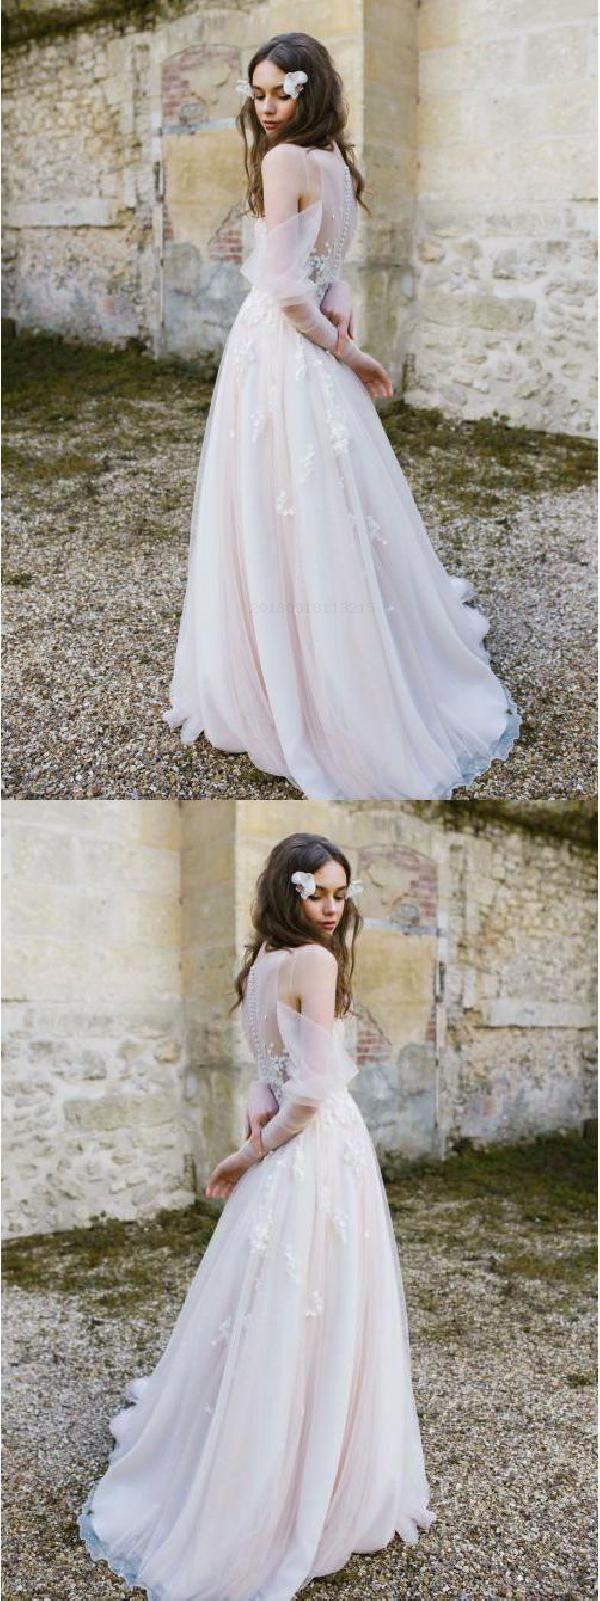 03d54fa9ec8b4 Wedding Dresses, Long Sleeves Wedding Dress #WeddingDresses  #LongSleevesWeddingDress Wedding Dresses 2018